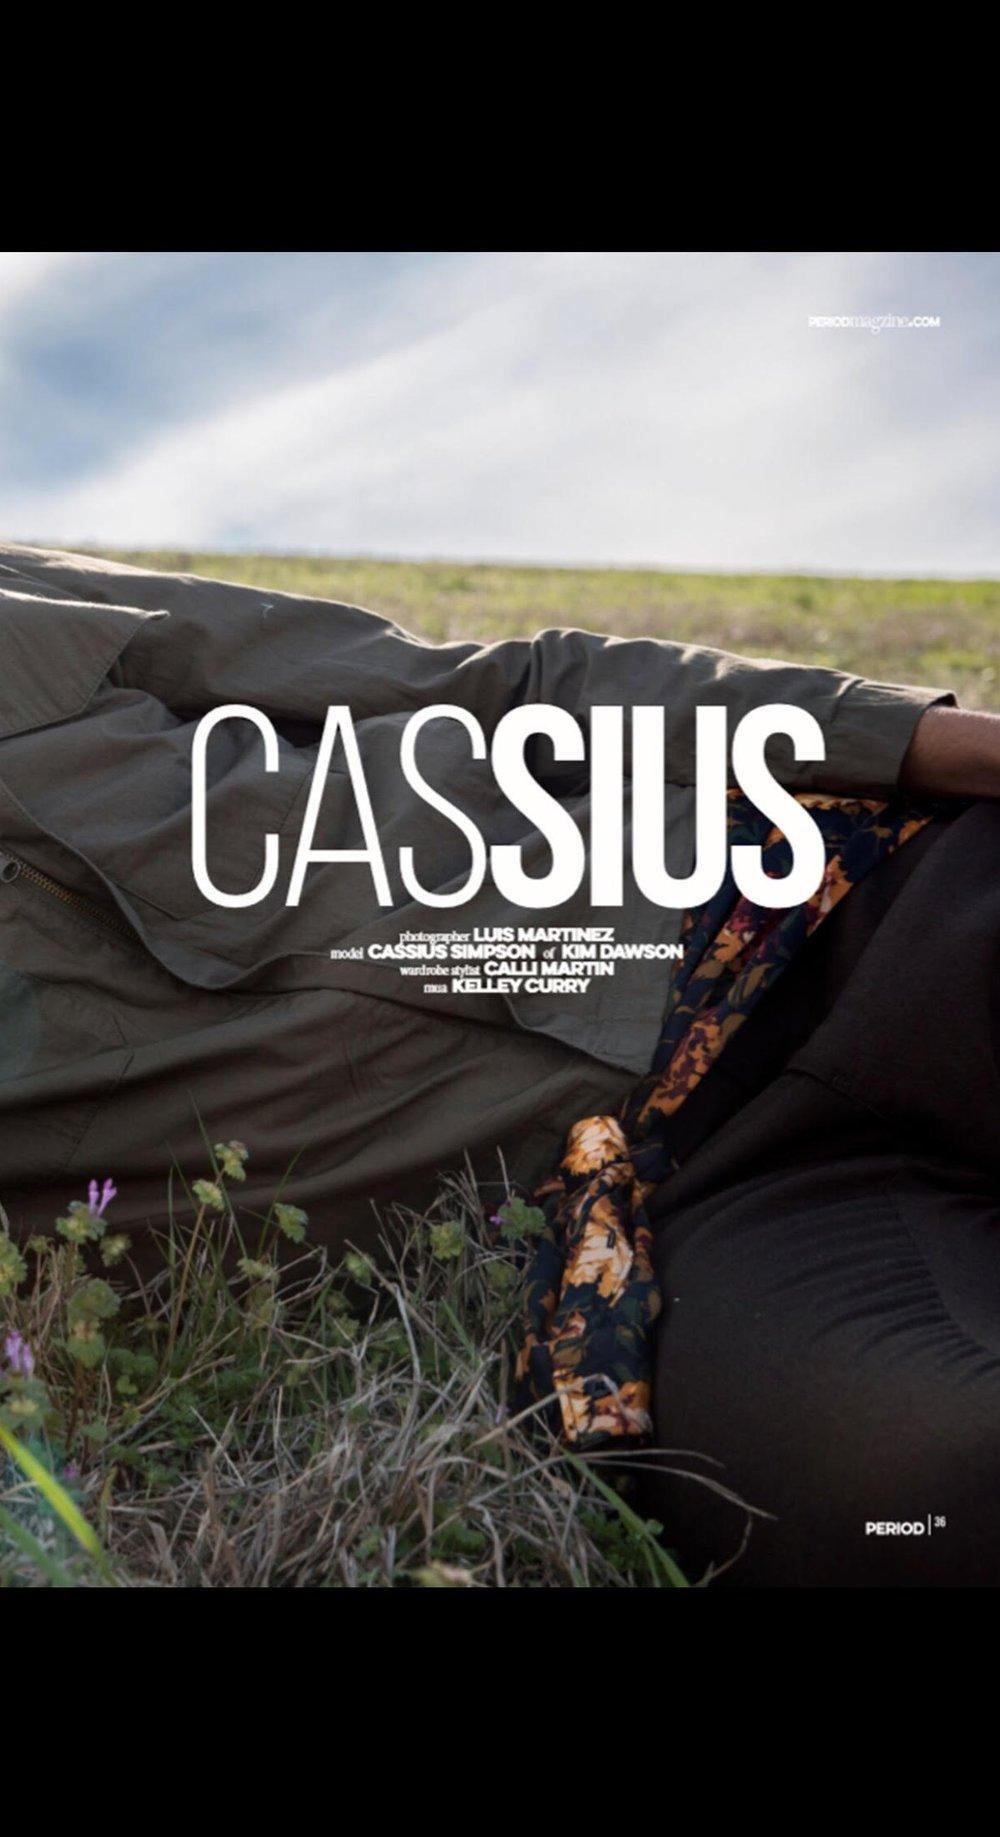 cassius - photographer : luis martinezmodel : cassius simpson of kim dawsonwardrobe stylist : calli martinmua : kelley curry